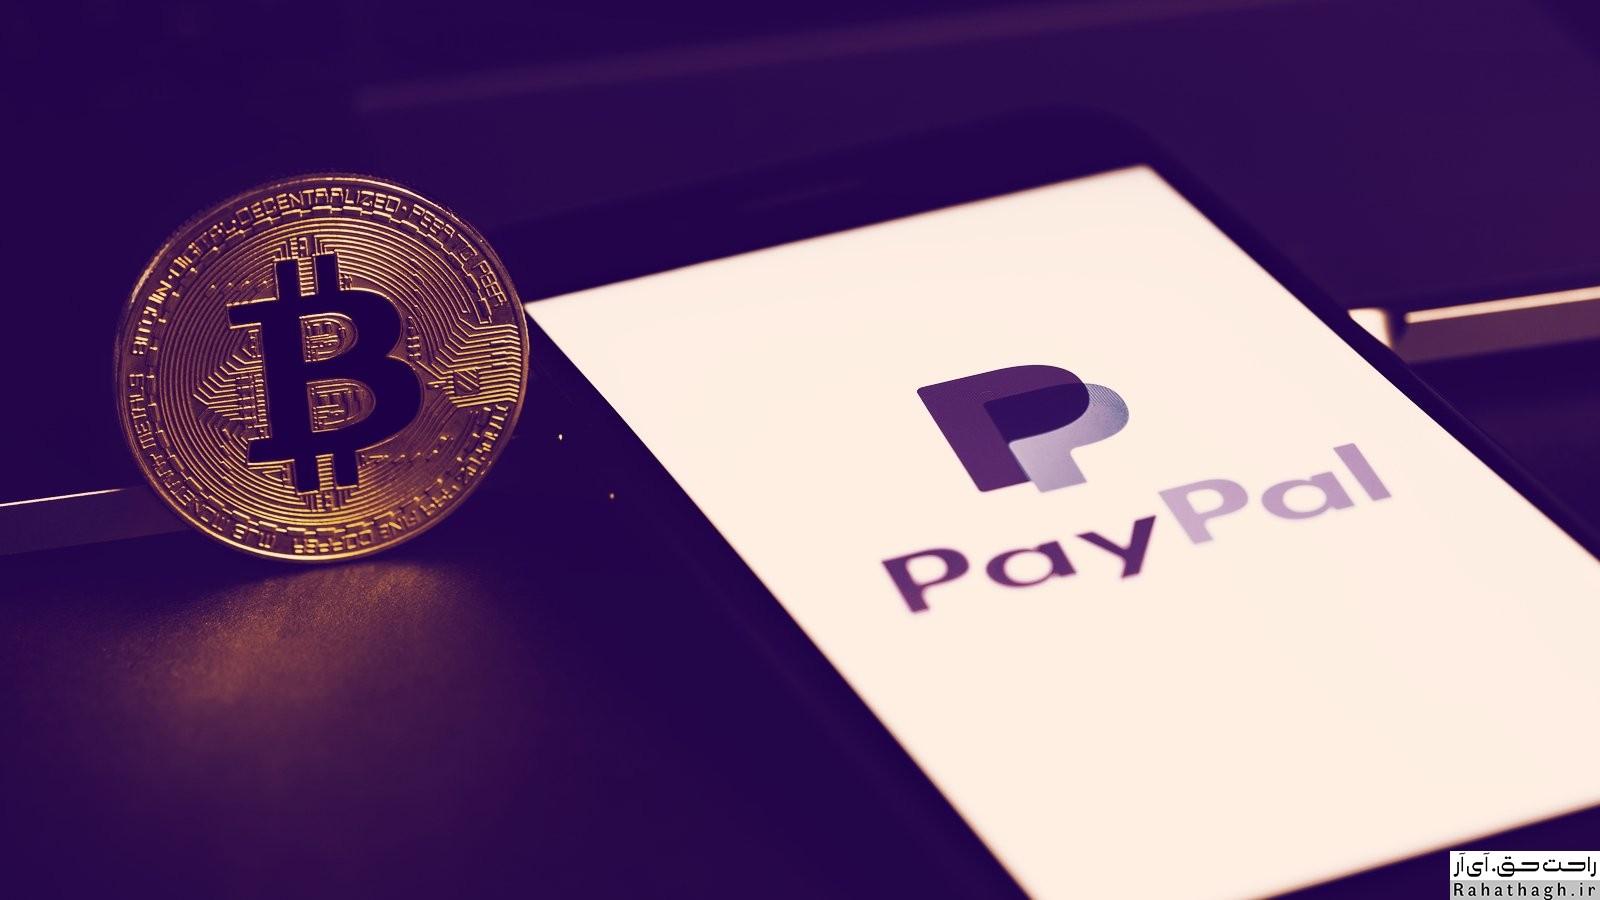 https://bayanbox.ir/view/4917559690098691152/paypal-bitcoin.jpg